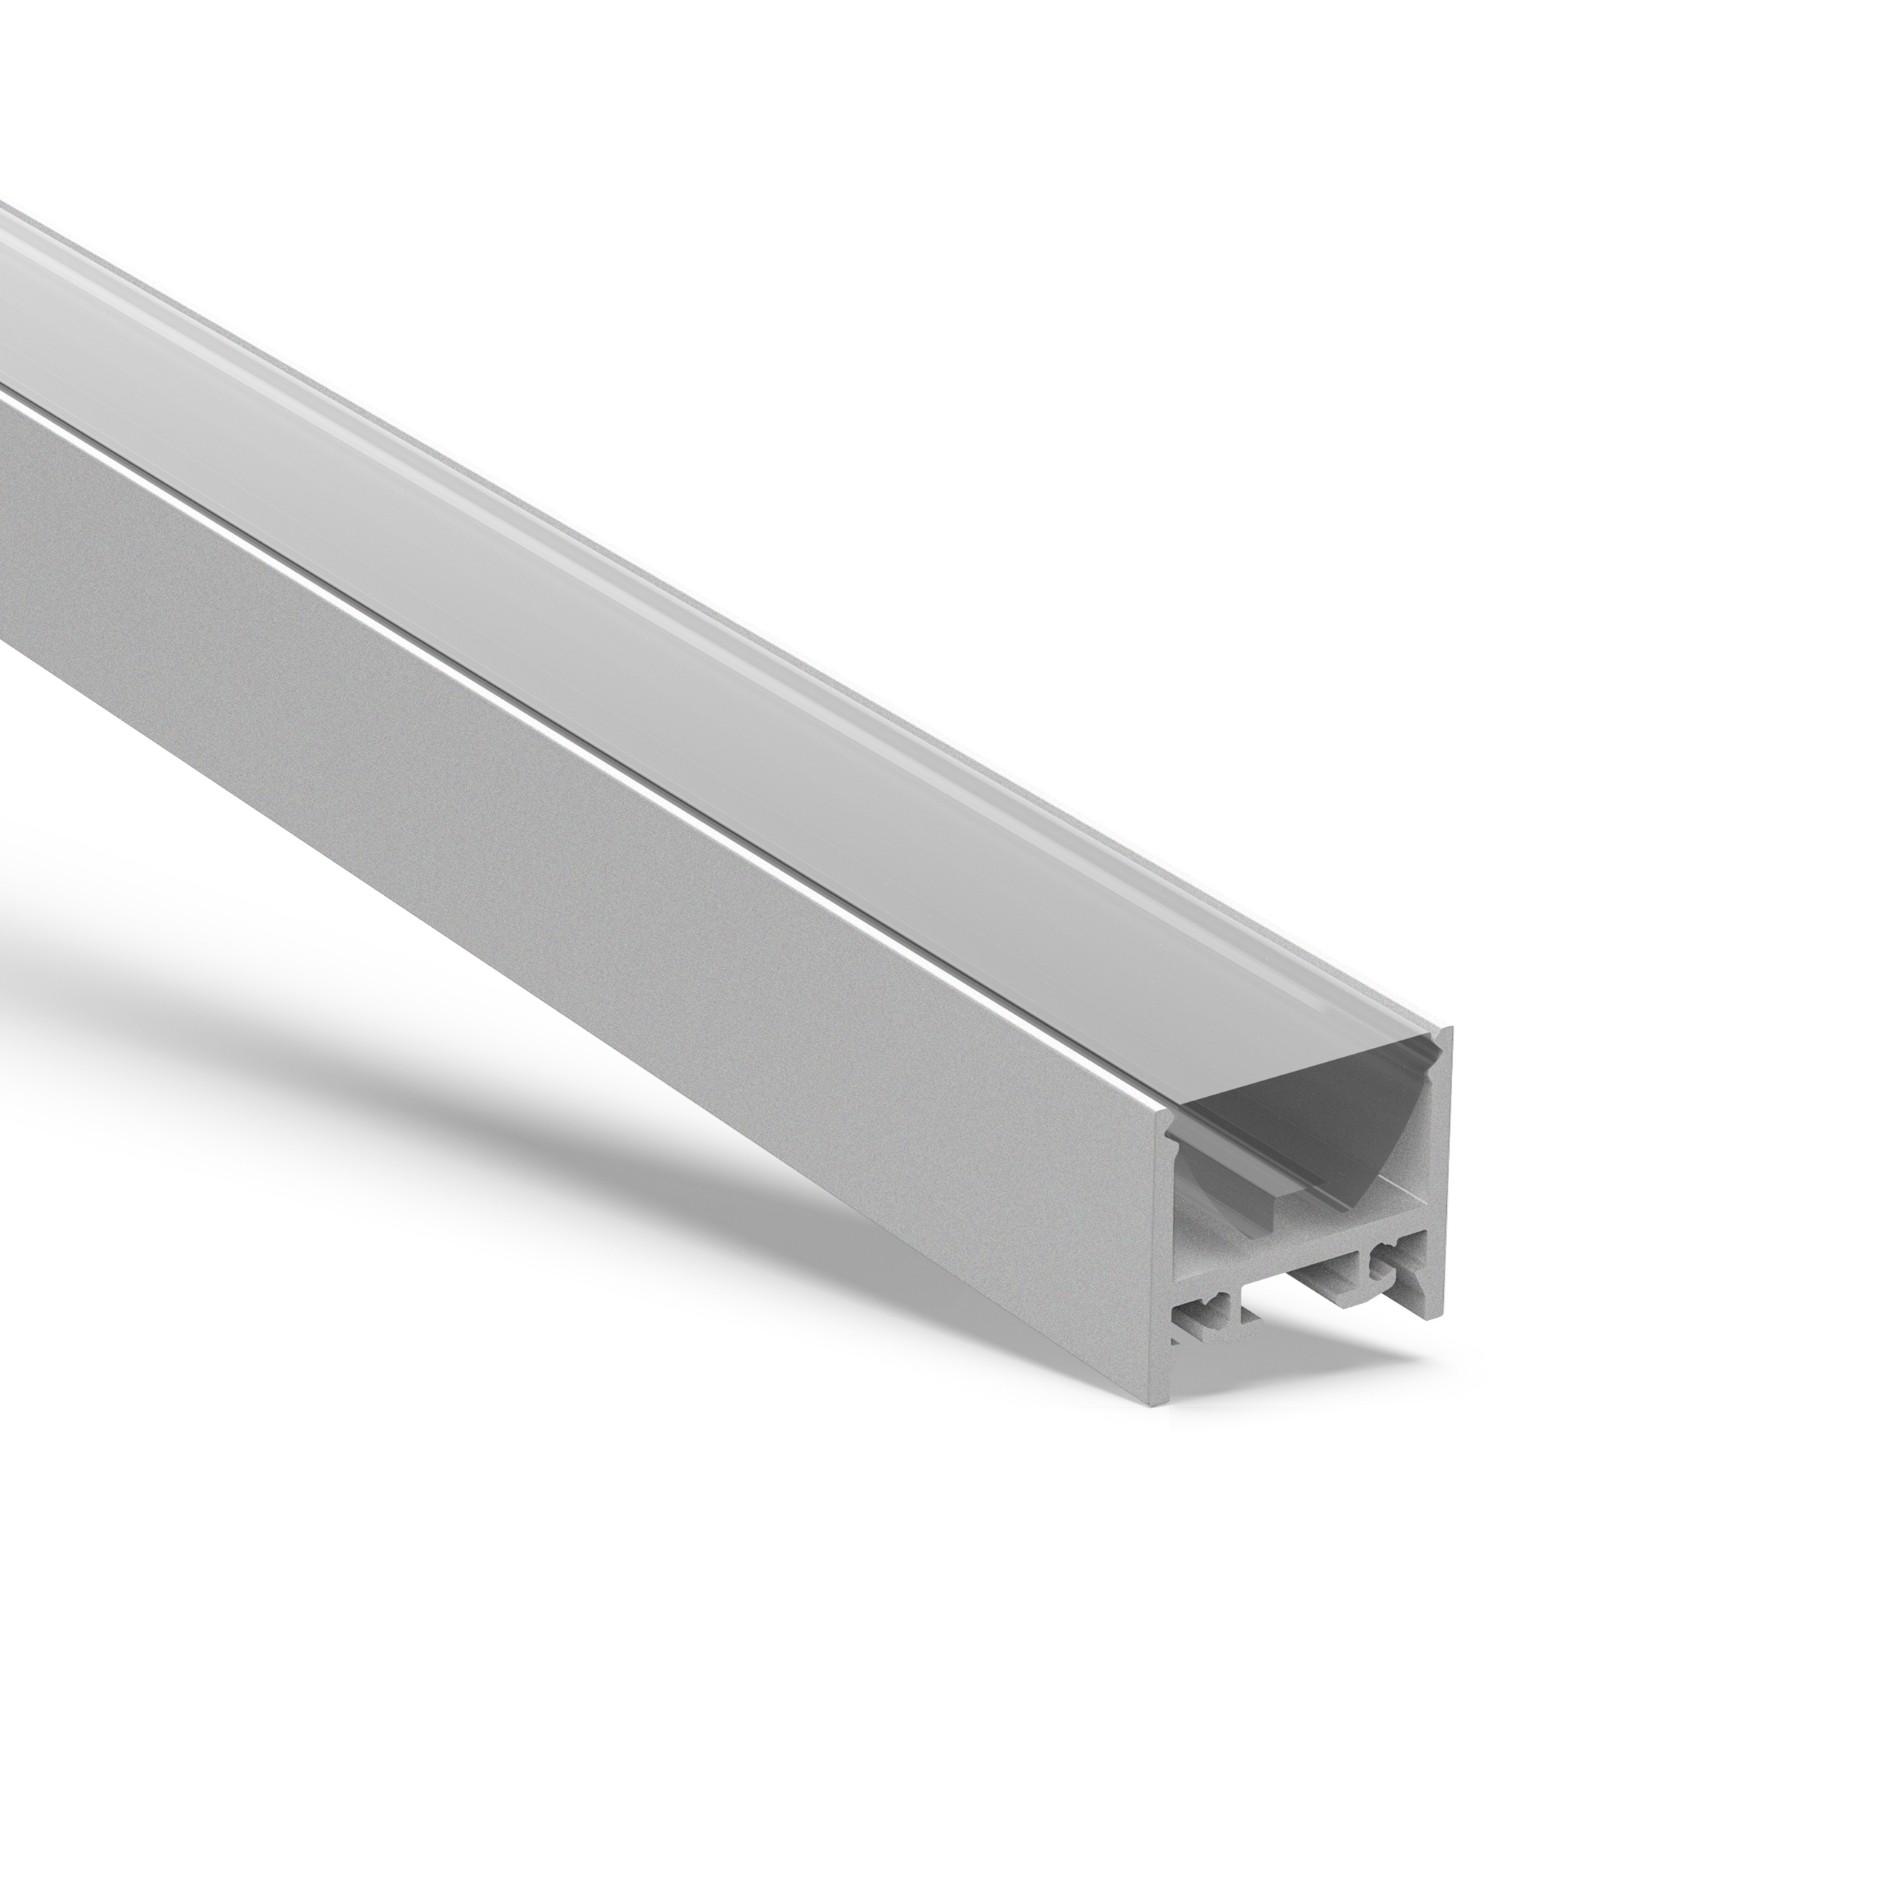 AT16-30 Foco 30 grados lente aluminio extrusión 19.5x17.35mm